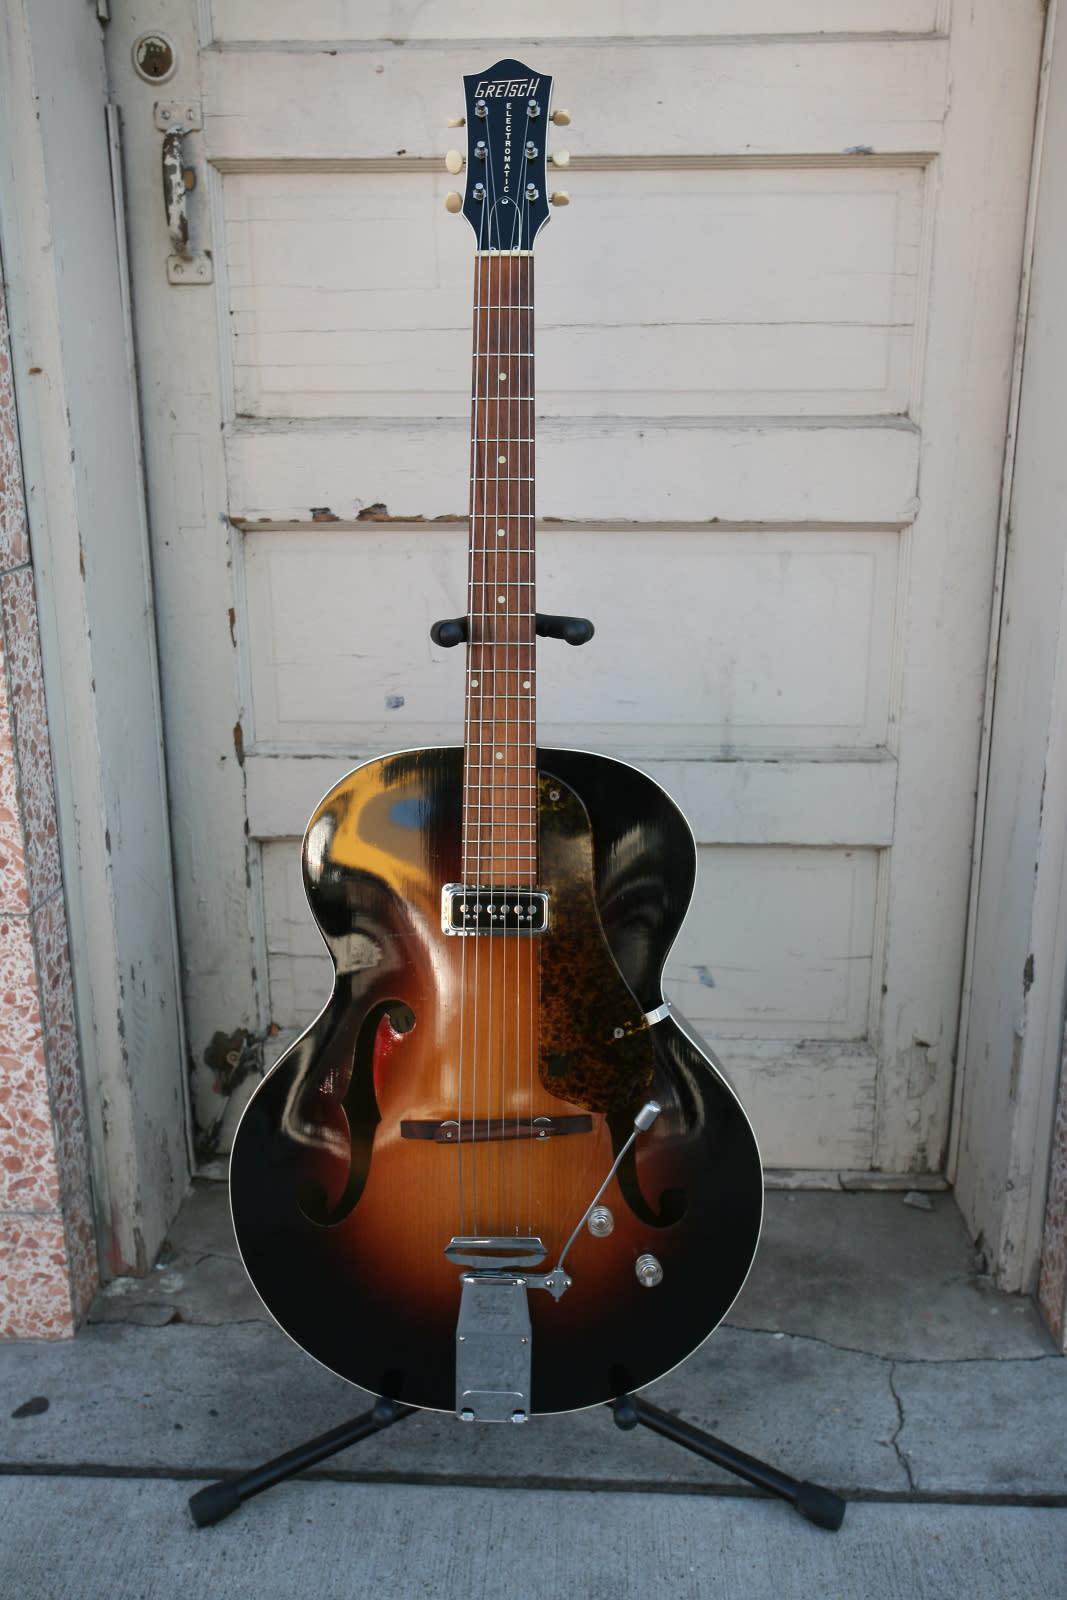 Gretsch 6182-3 Hollowbody 1953 or 1954 Sunburst